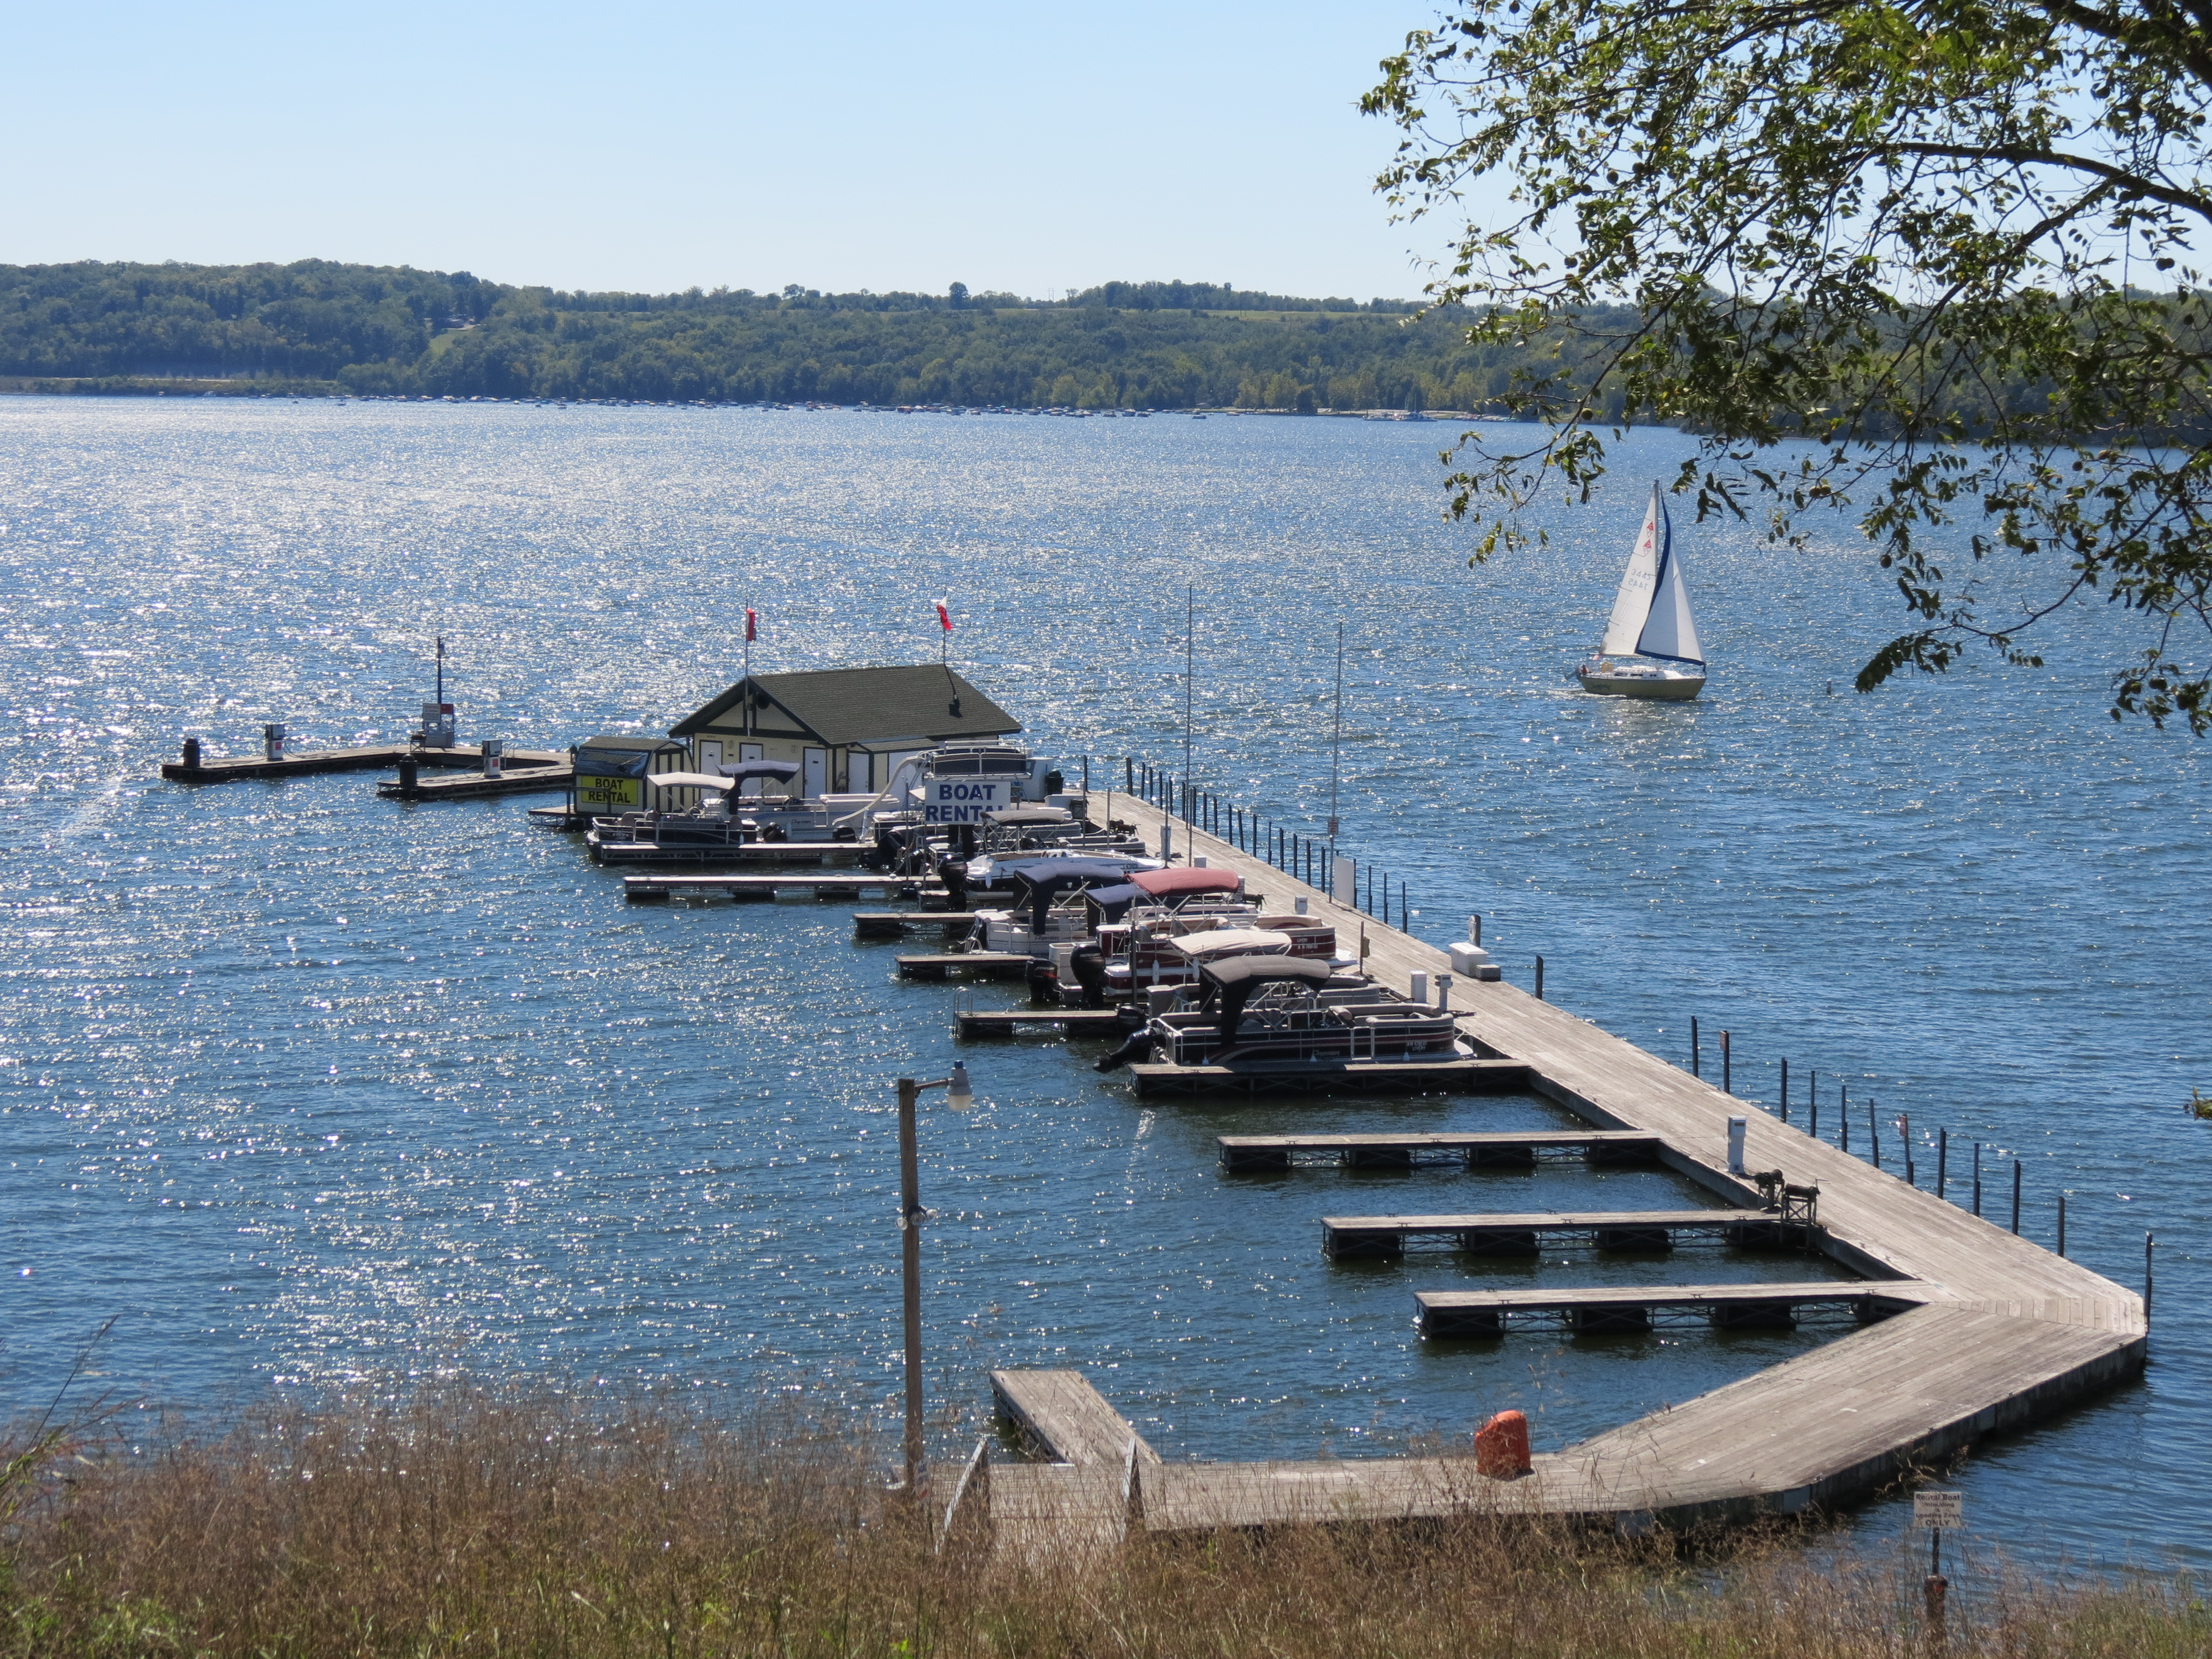 Dockage Rates Kent S Harbor Inc